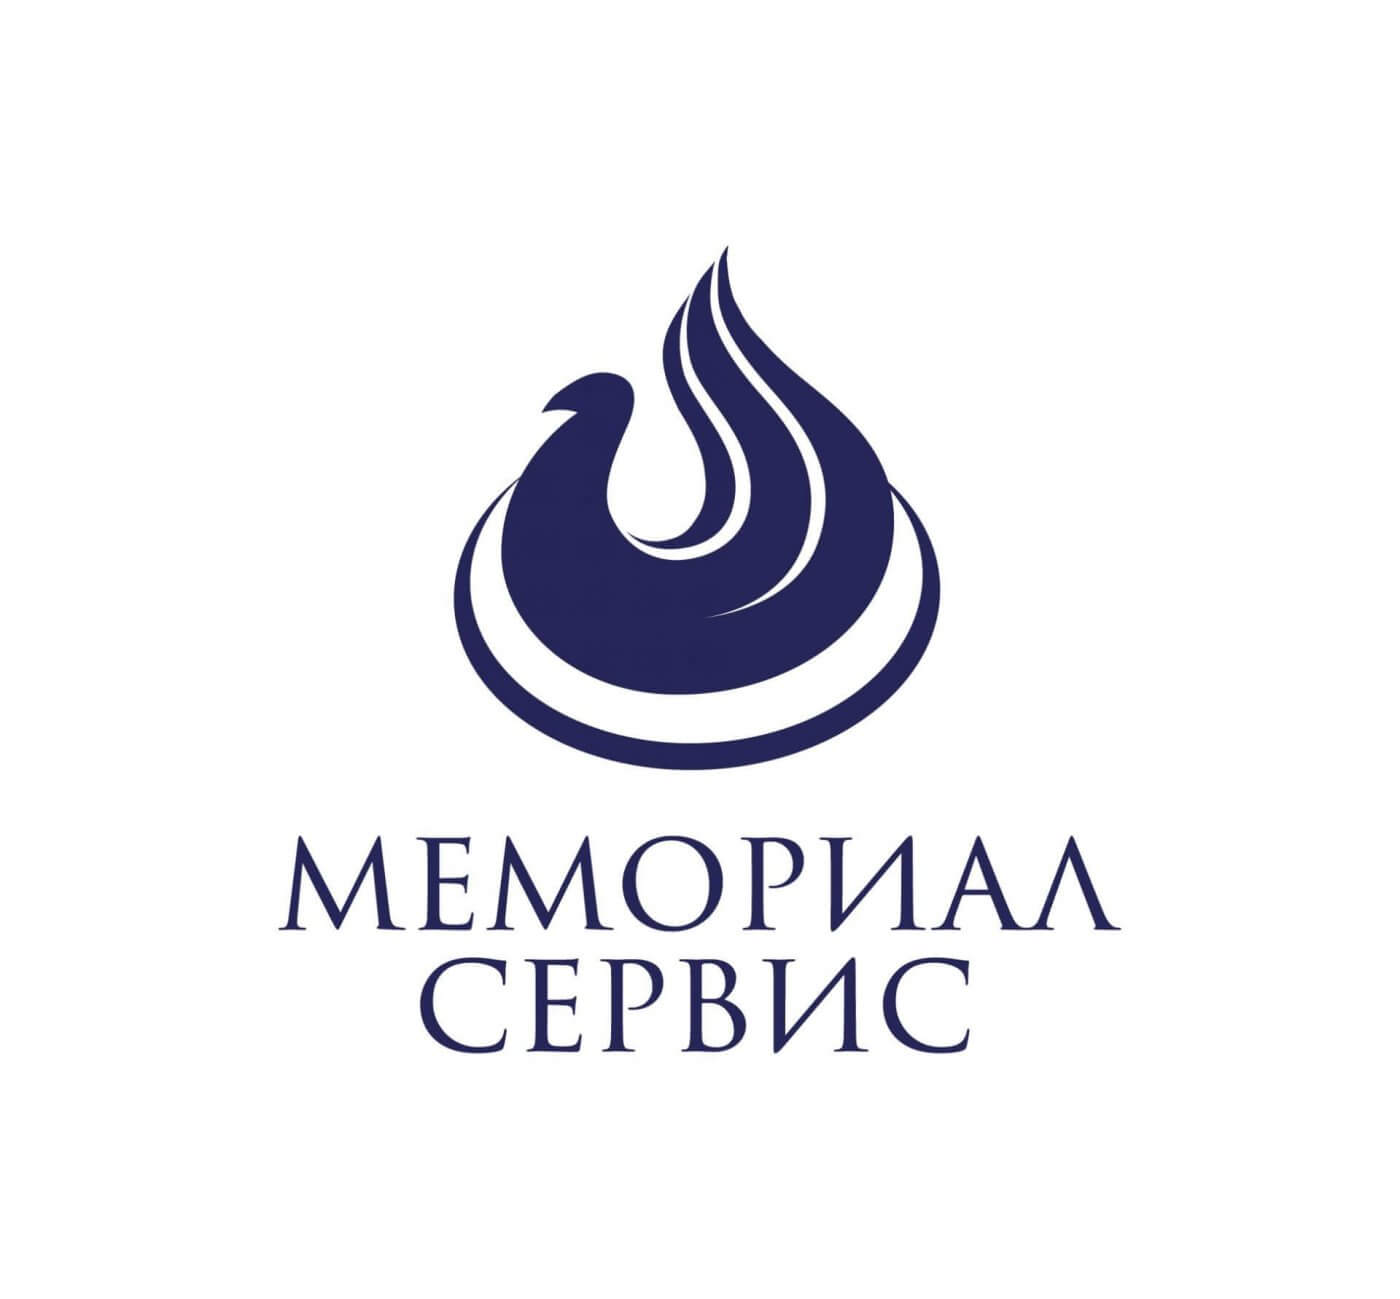 Франшиза ритуального агентства Меморіал Сервіс